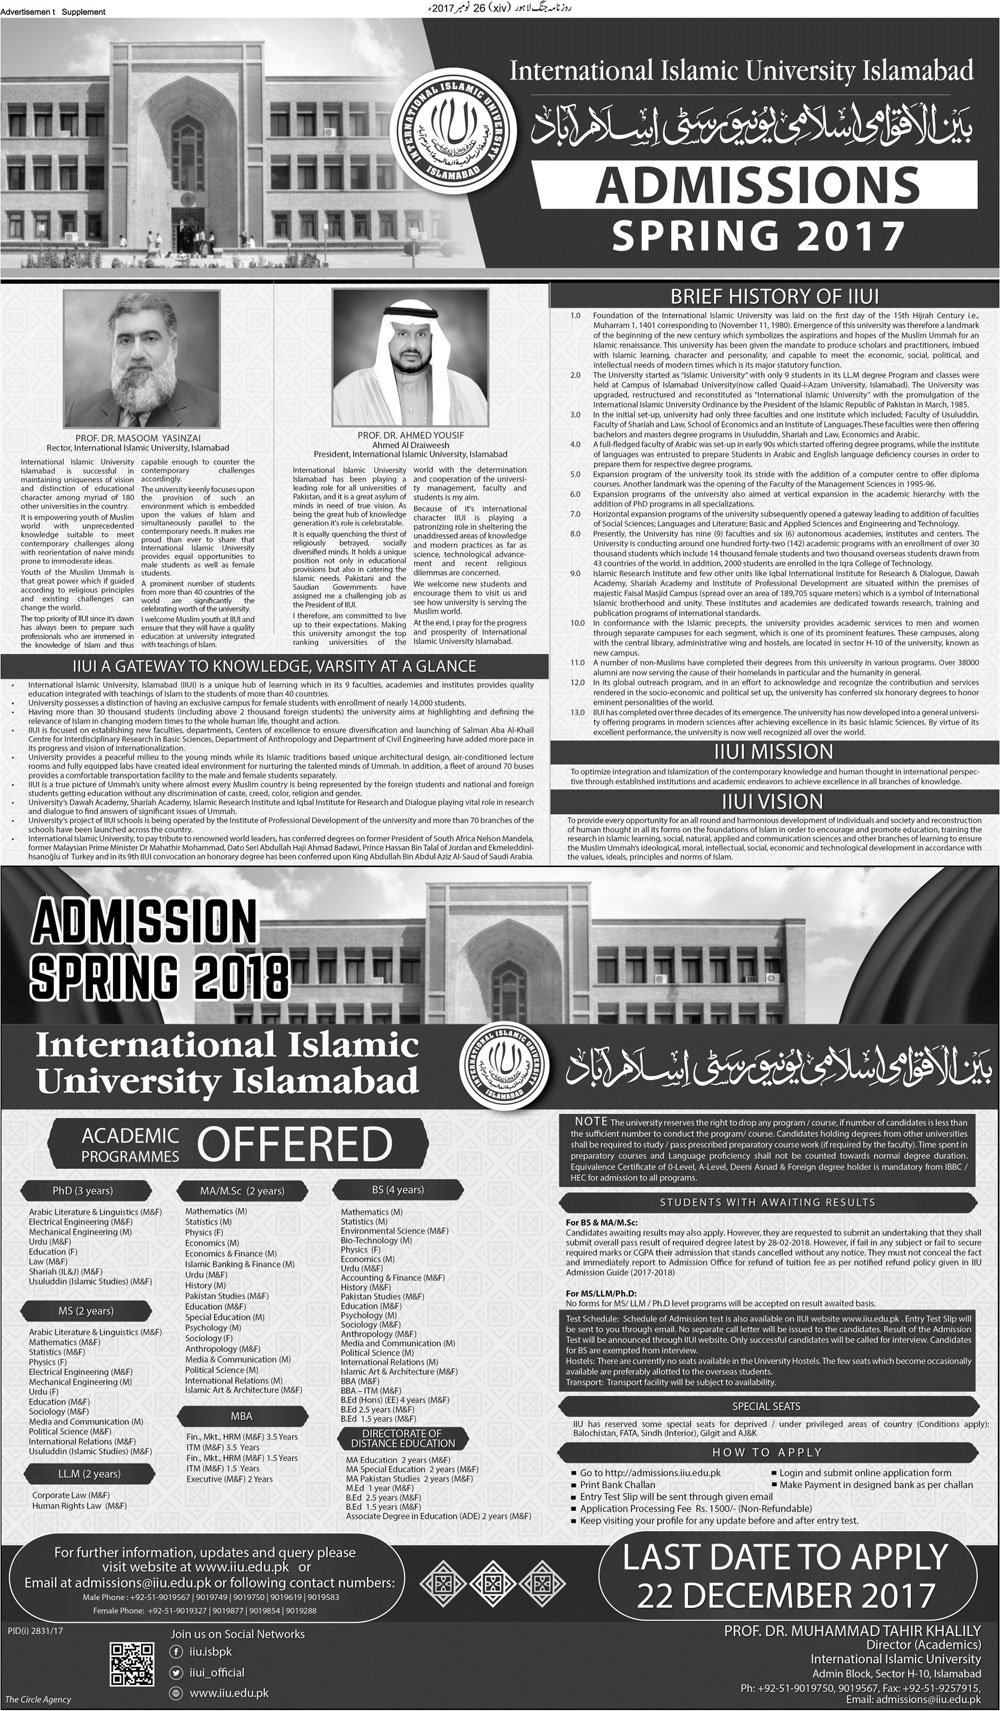 International Islamic University (IIU) Islamabad Admissions 2018